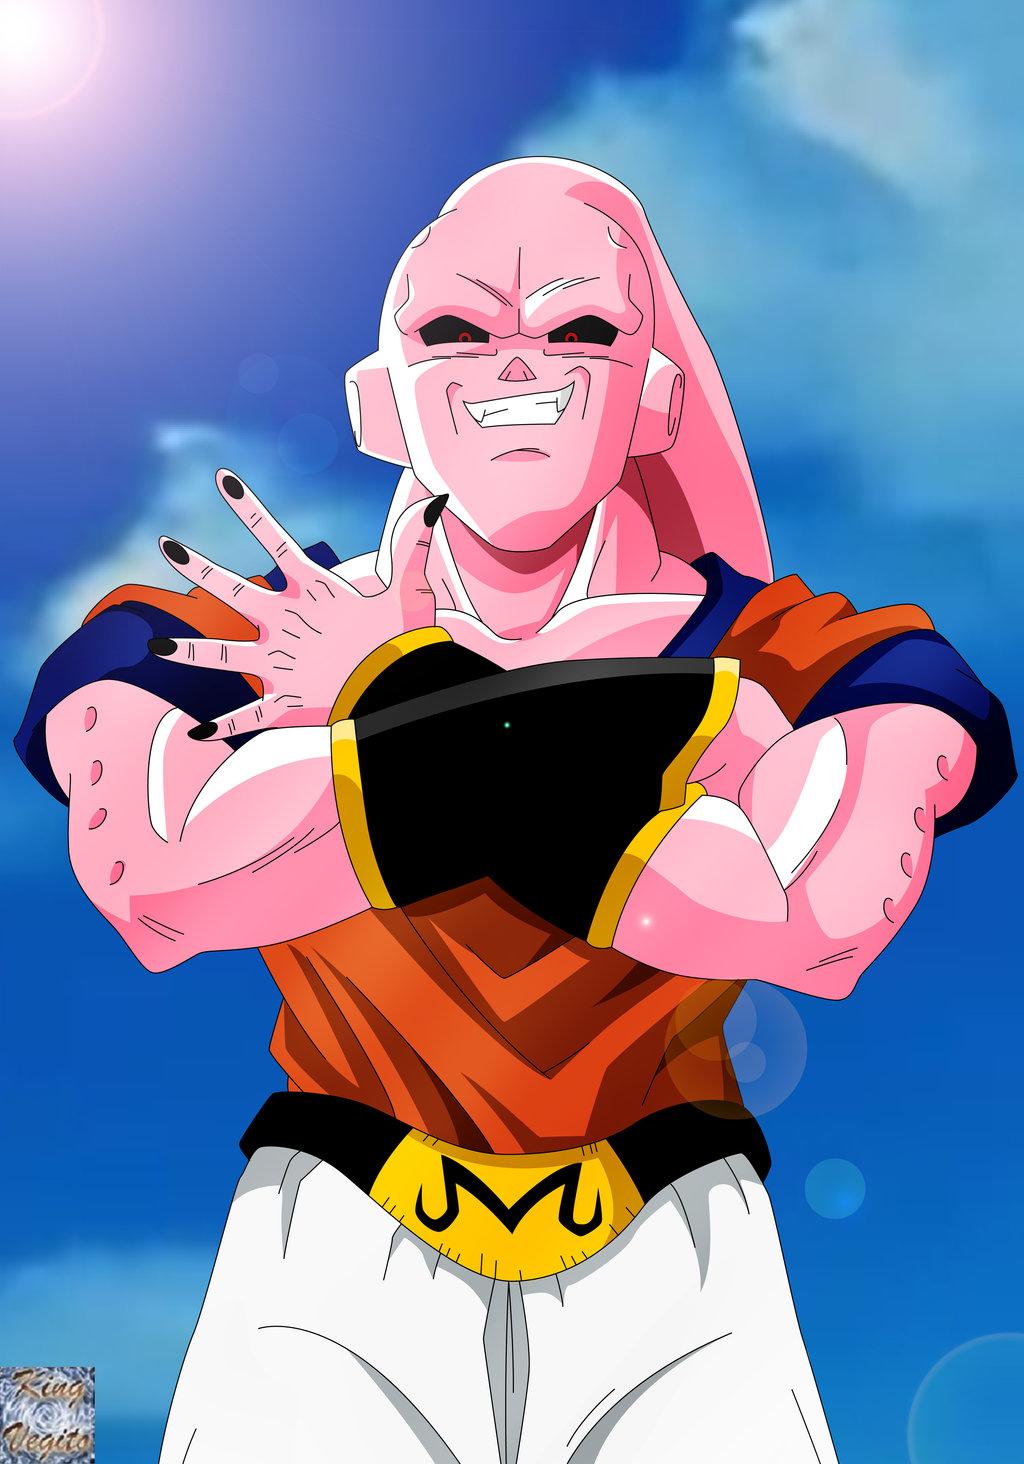 Super Buu Gohan Absorbed by kingvegito 1024x1464